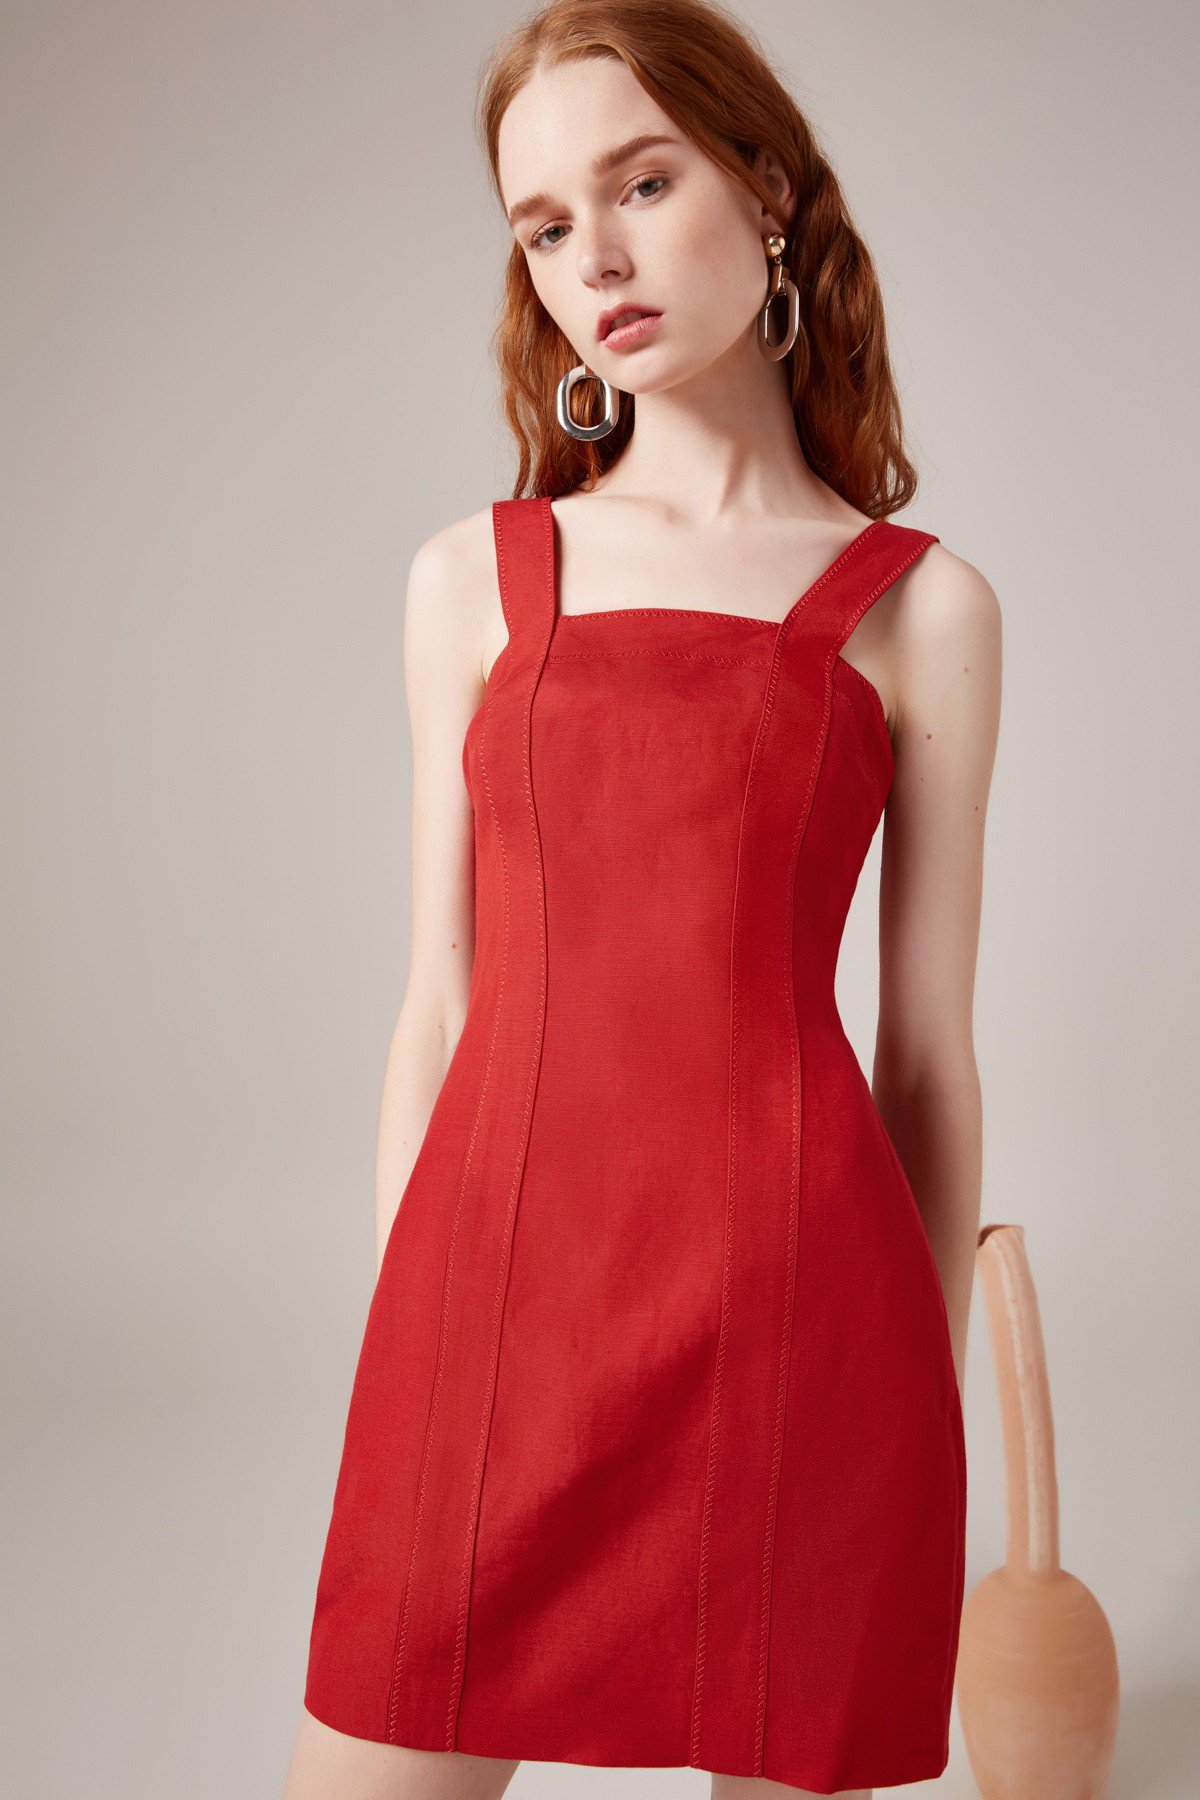 Shop C/MEO Confessions Mini Dress.